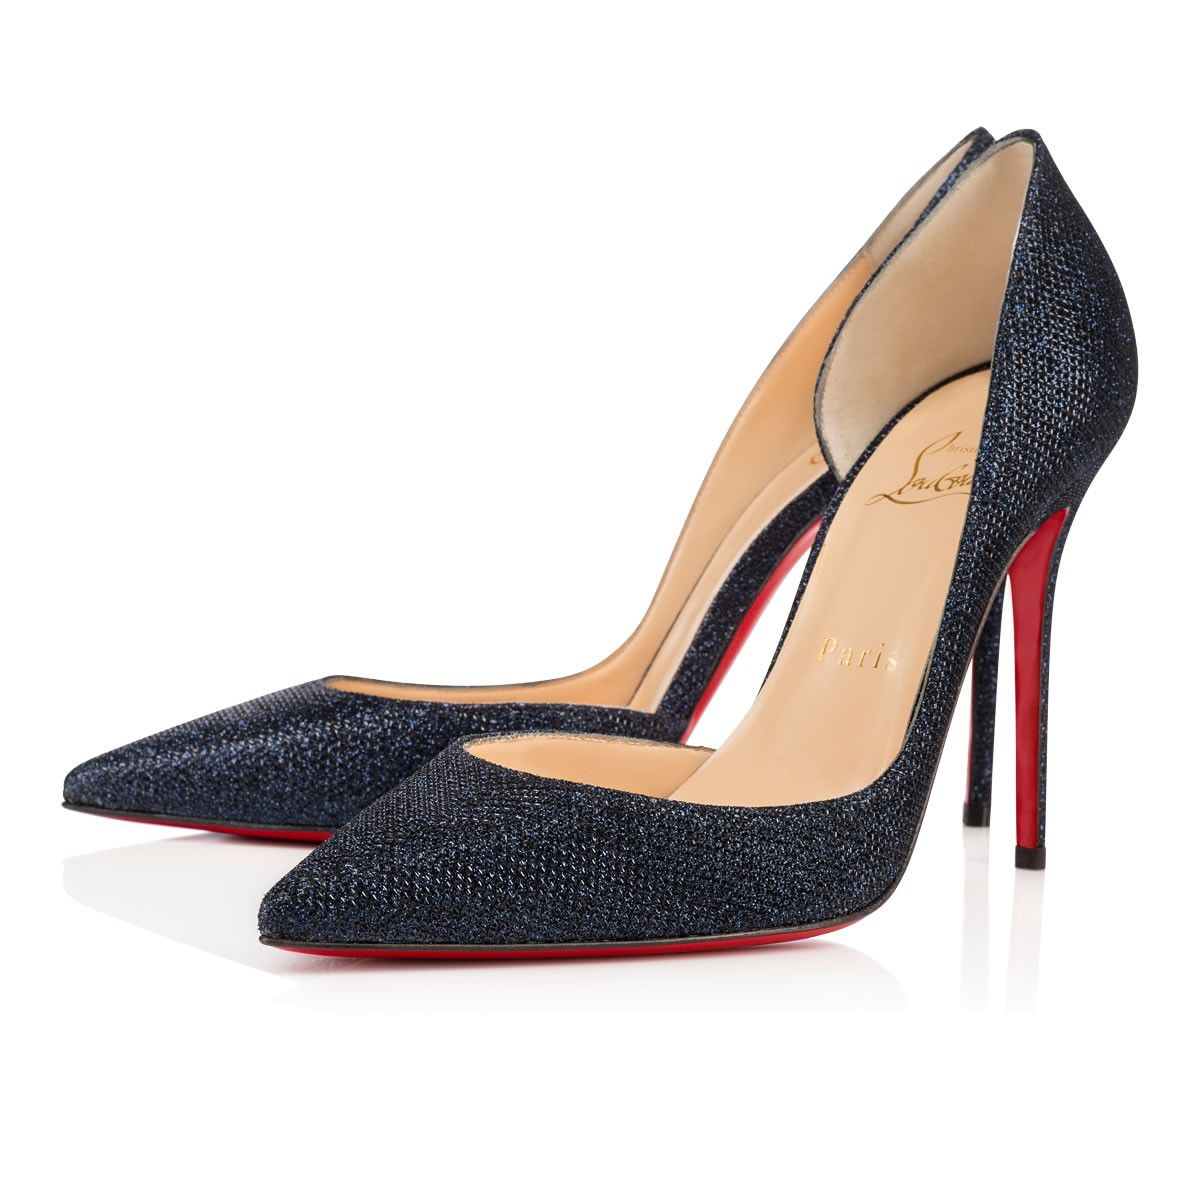 the best attitude 9b031 b48b3 Iriza 100 Black Patent Leather - Women Shoes - Christian ...